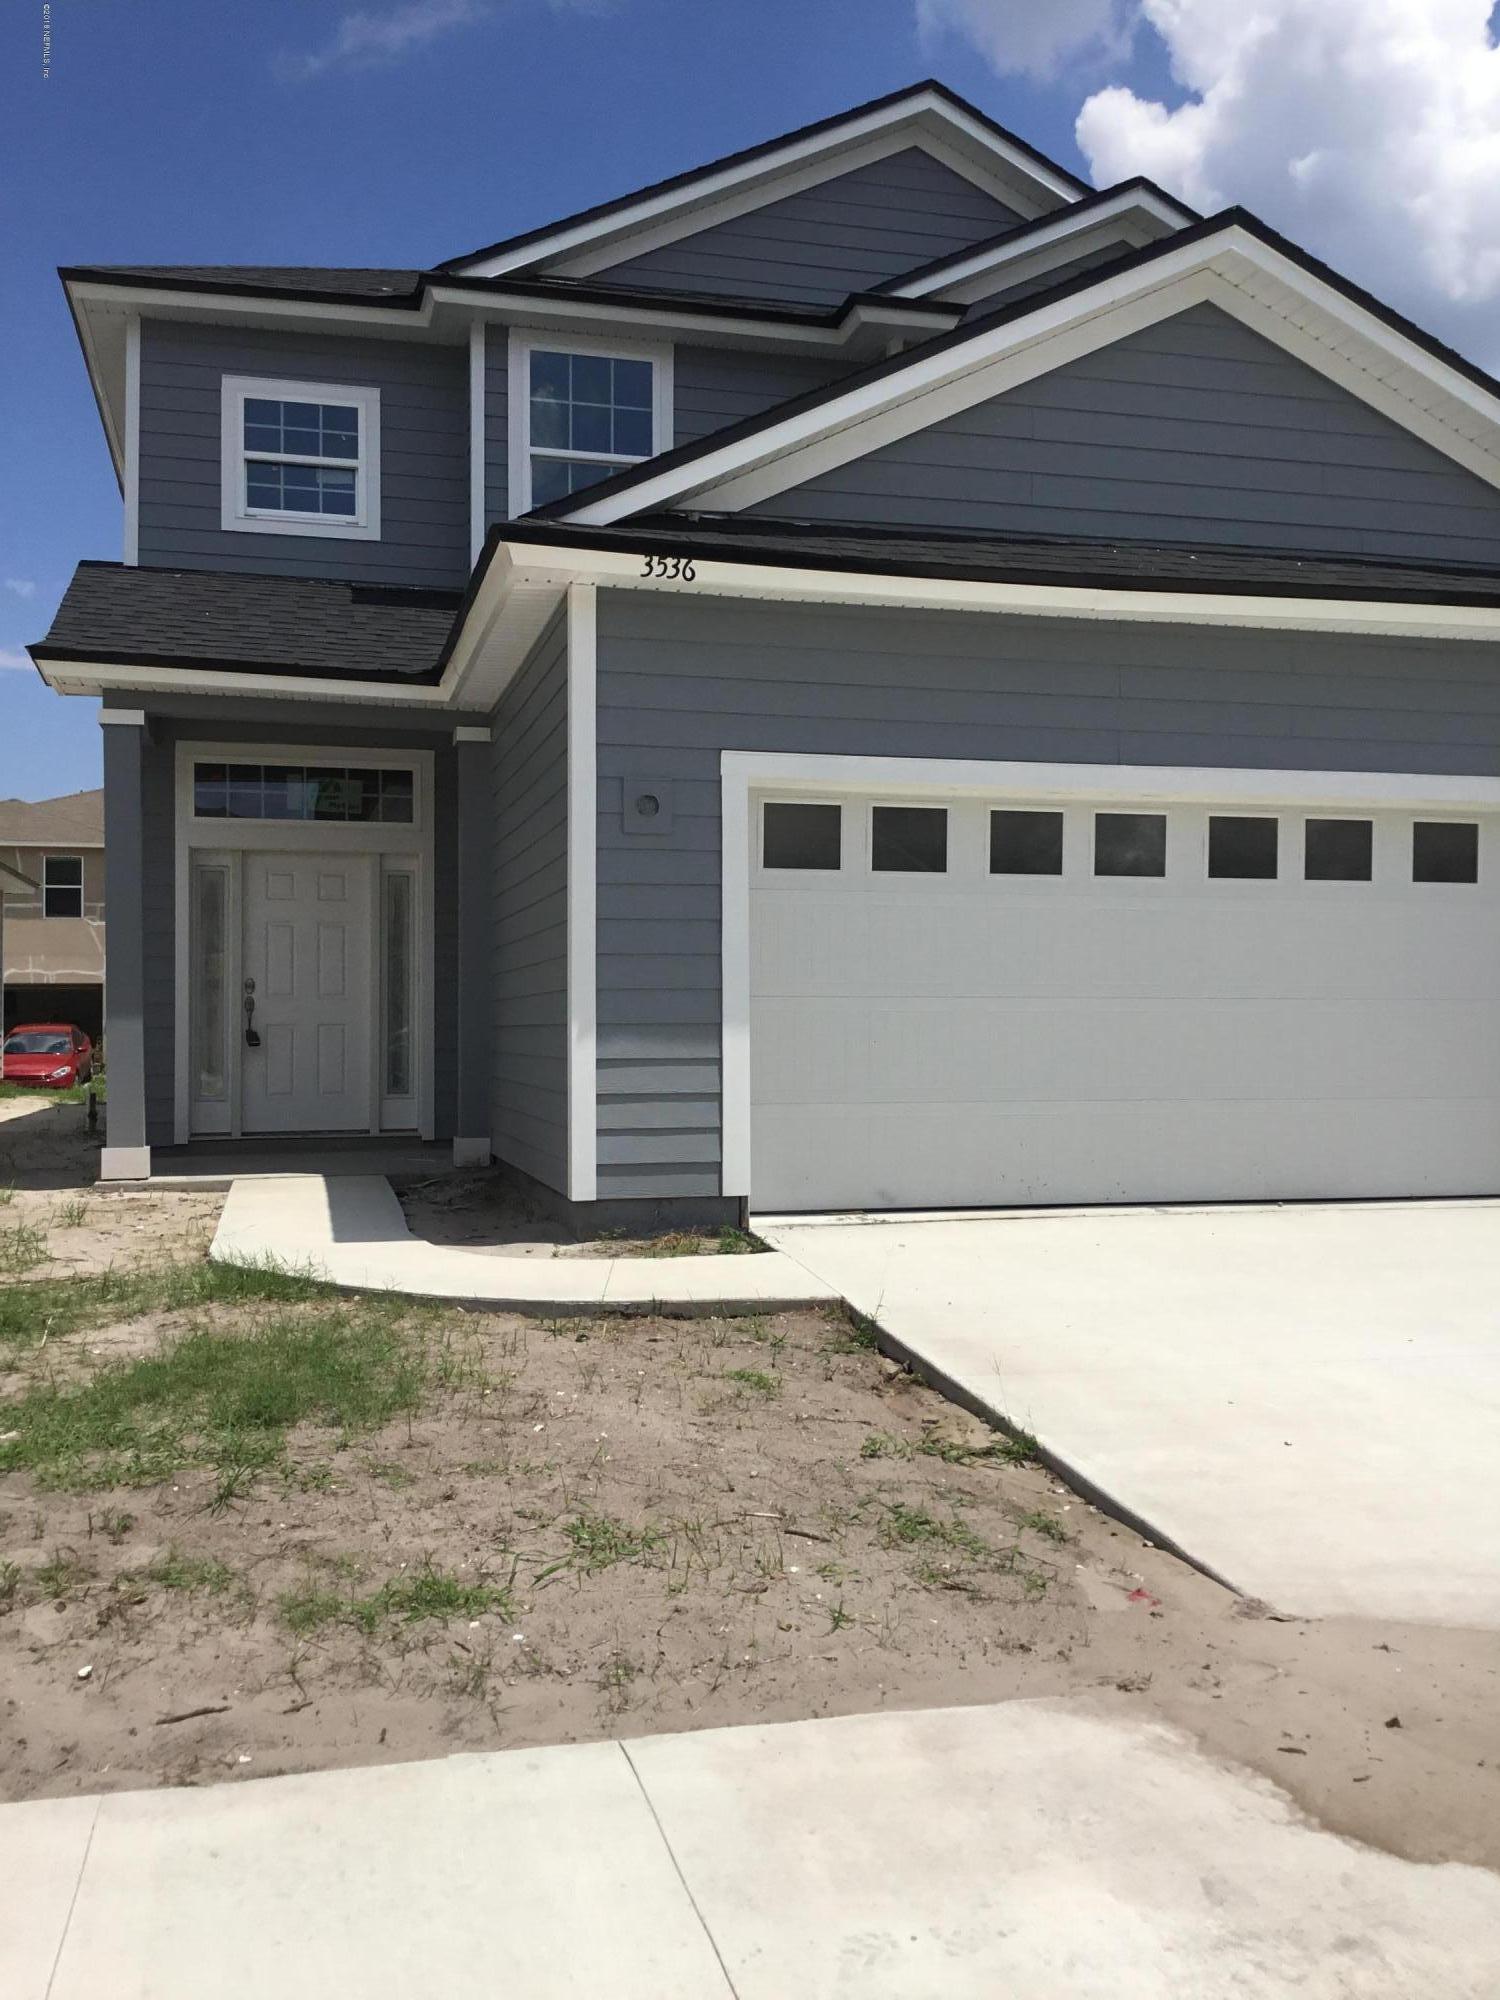 3536 HAWTHORN, ORANGE PARK, FLORIDA 32065, 4 Bedrooms Bedrooms, ,2 BathroomsBathrooms,Residential - single family,For sale,HAWTHORN,936262